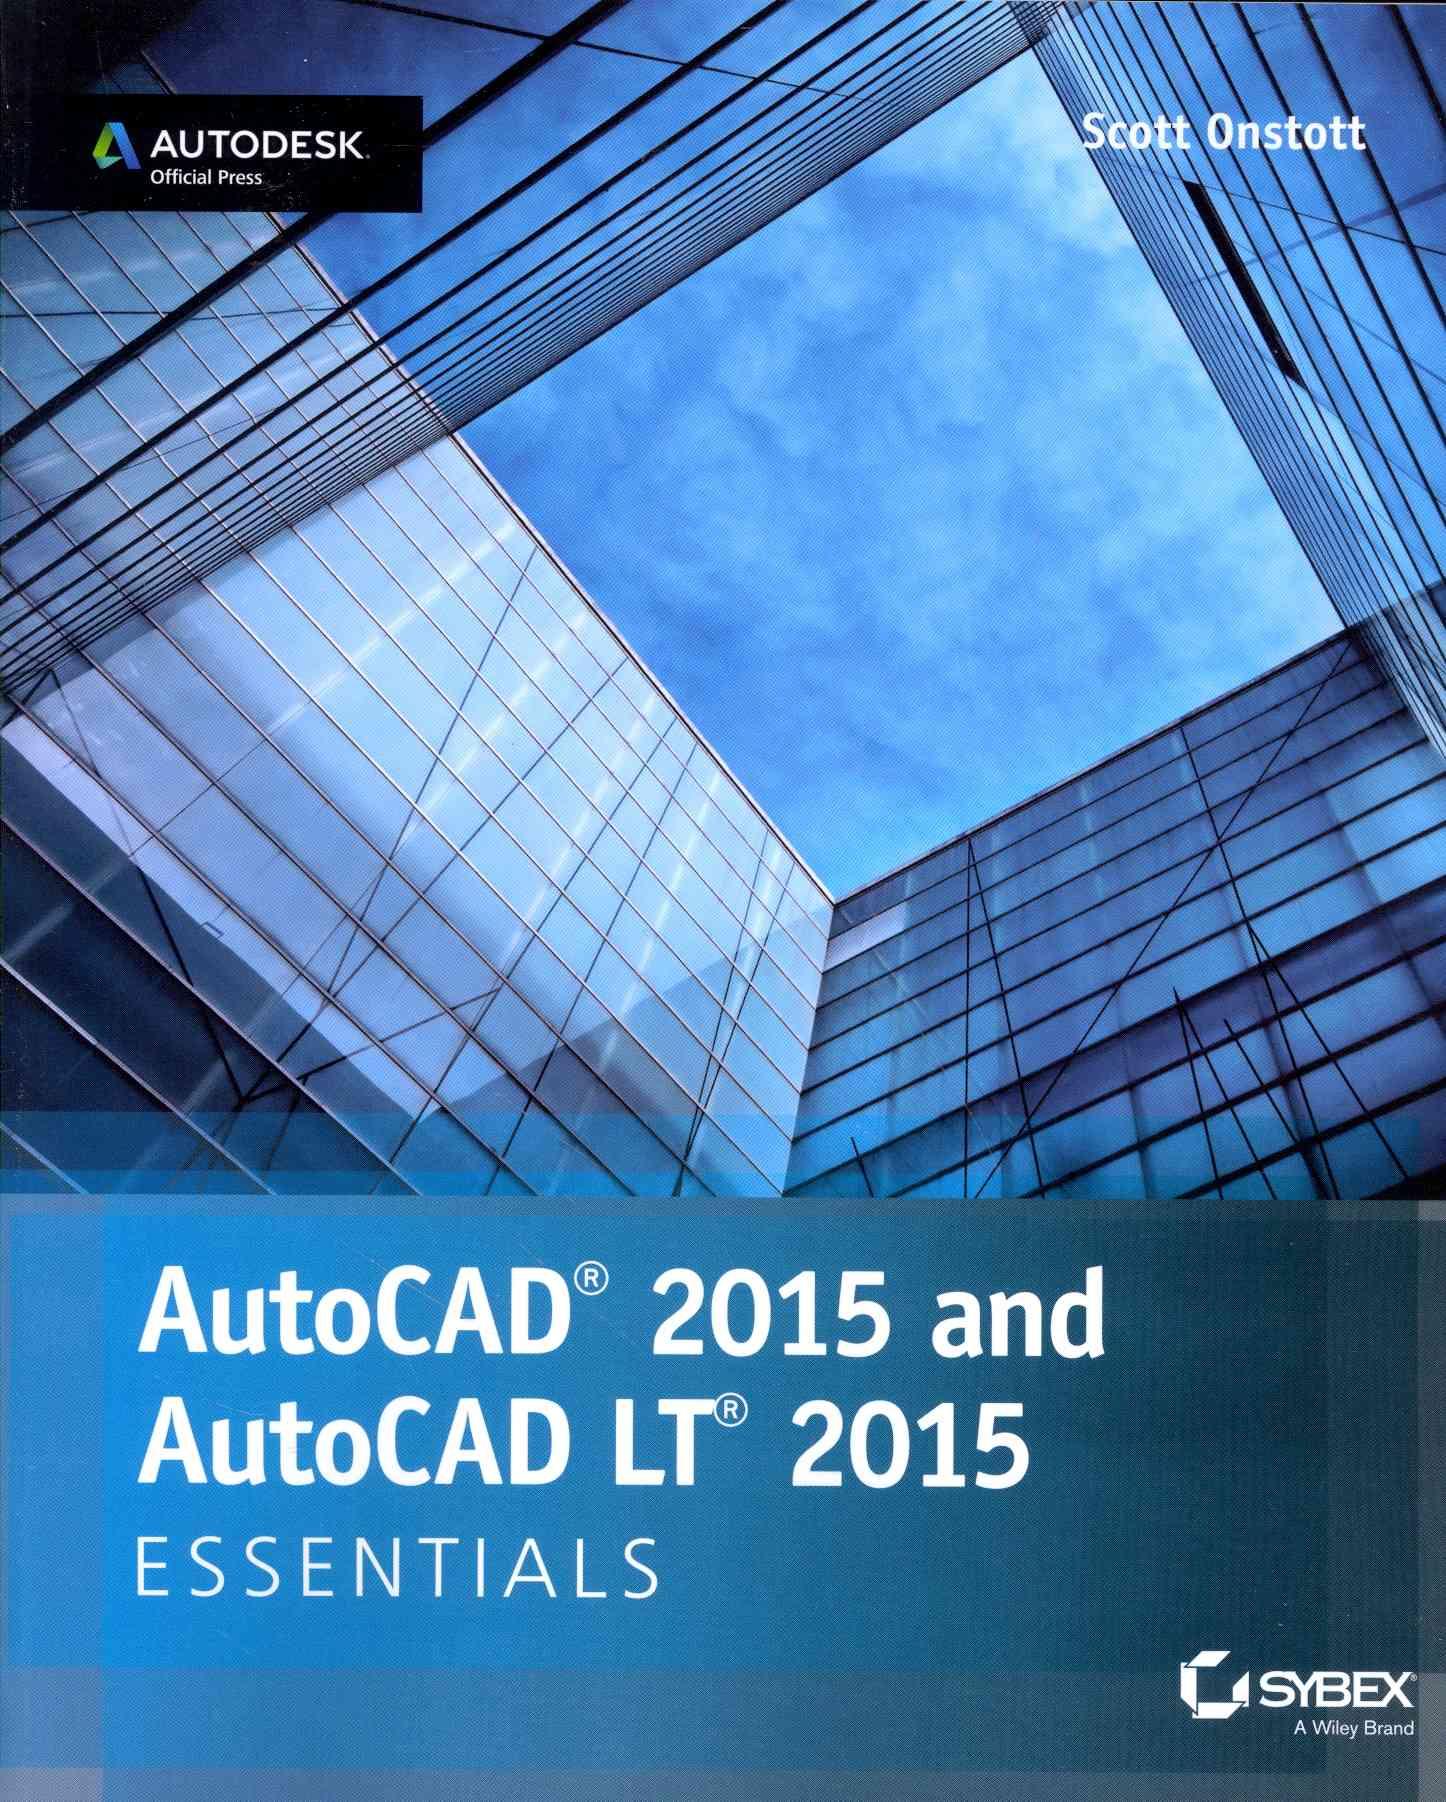 Autocad 2015 and Autocad Lt 2015 Essentials By Onstott, Scott